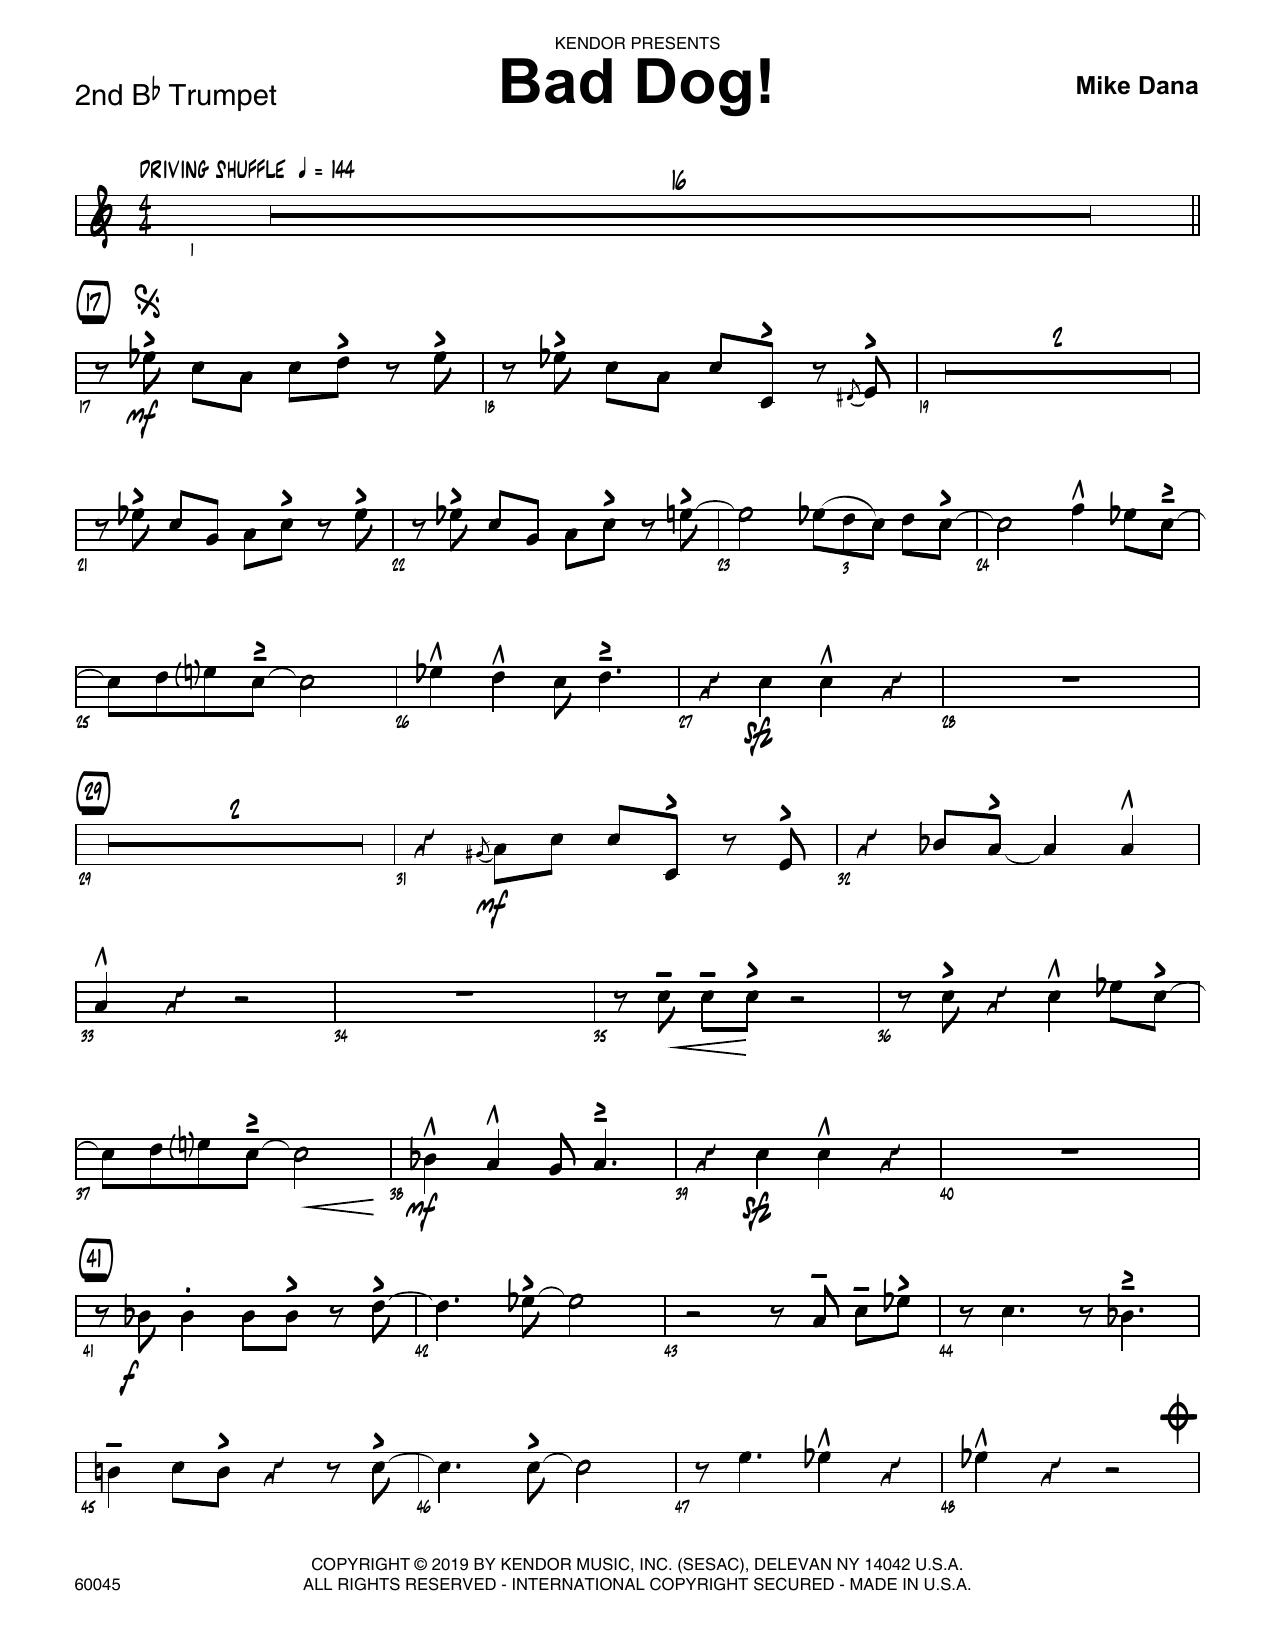 Mike Dana Bad Dog! - 2nd Bb Trumpet sheet music notes and chords. Download Printable PDF.